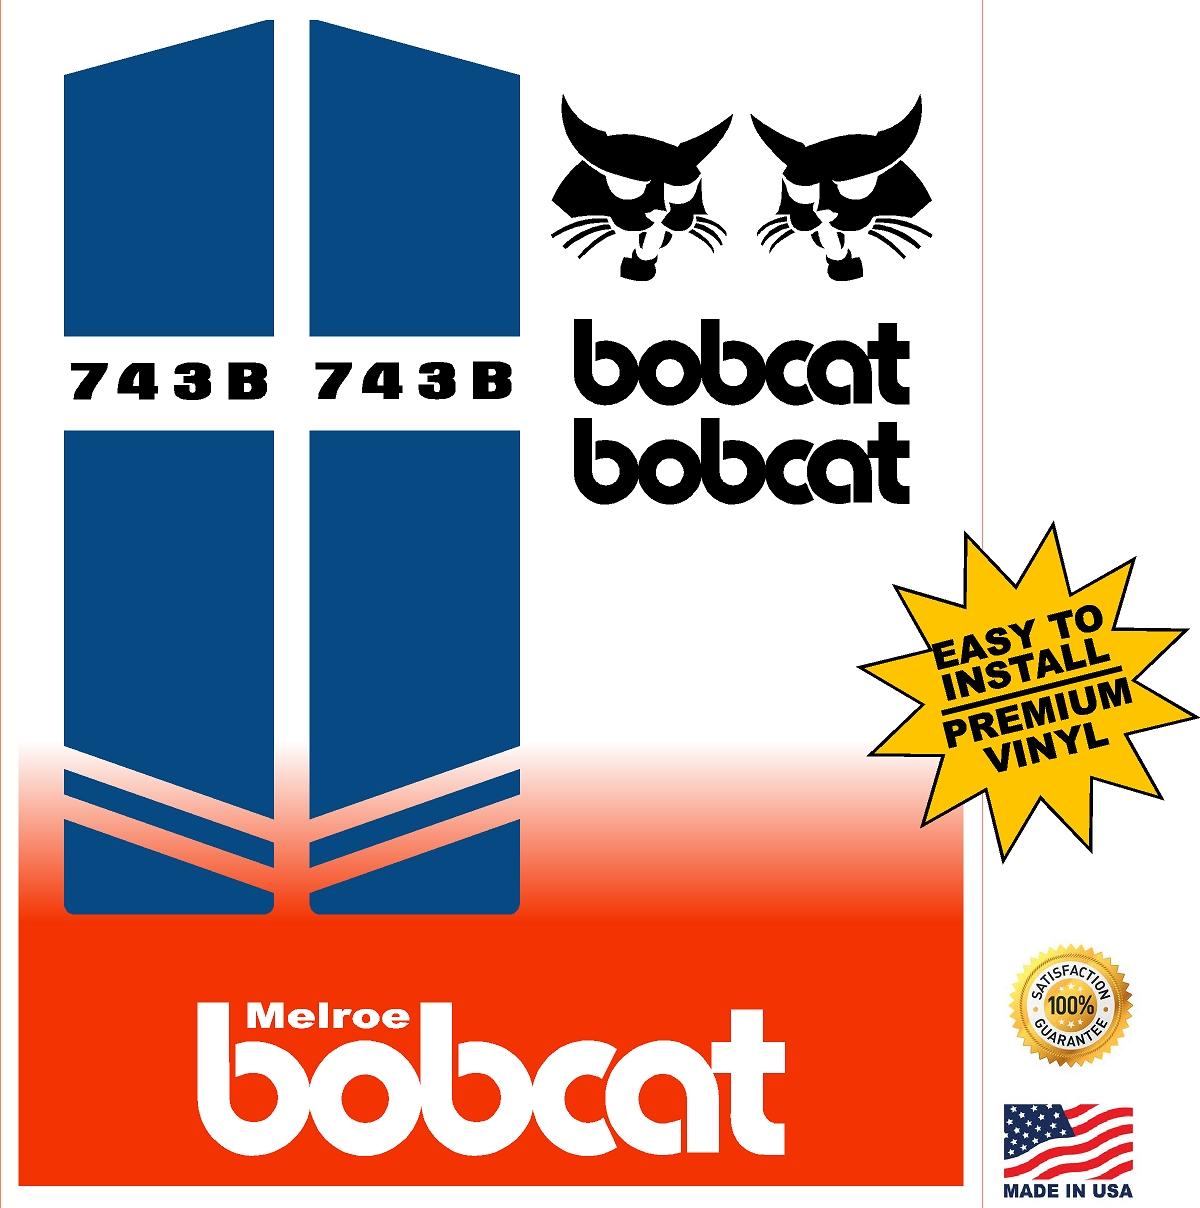 Bobcat 743b Replacement Decal Kit Machine Decals